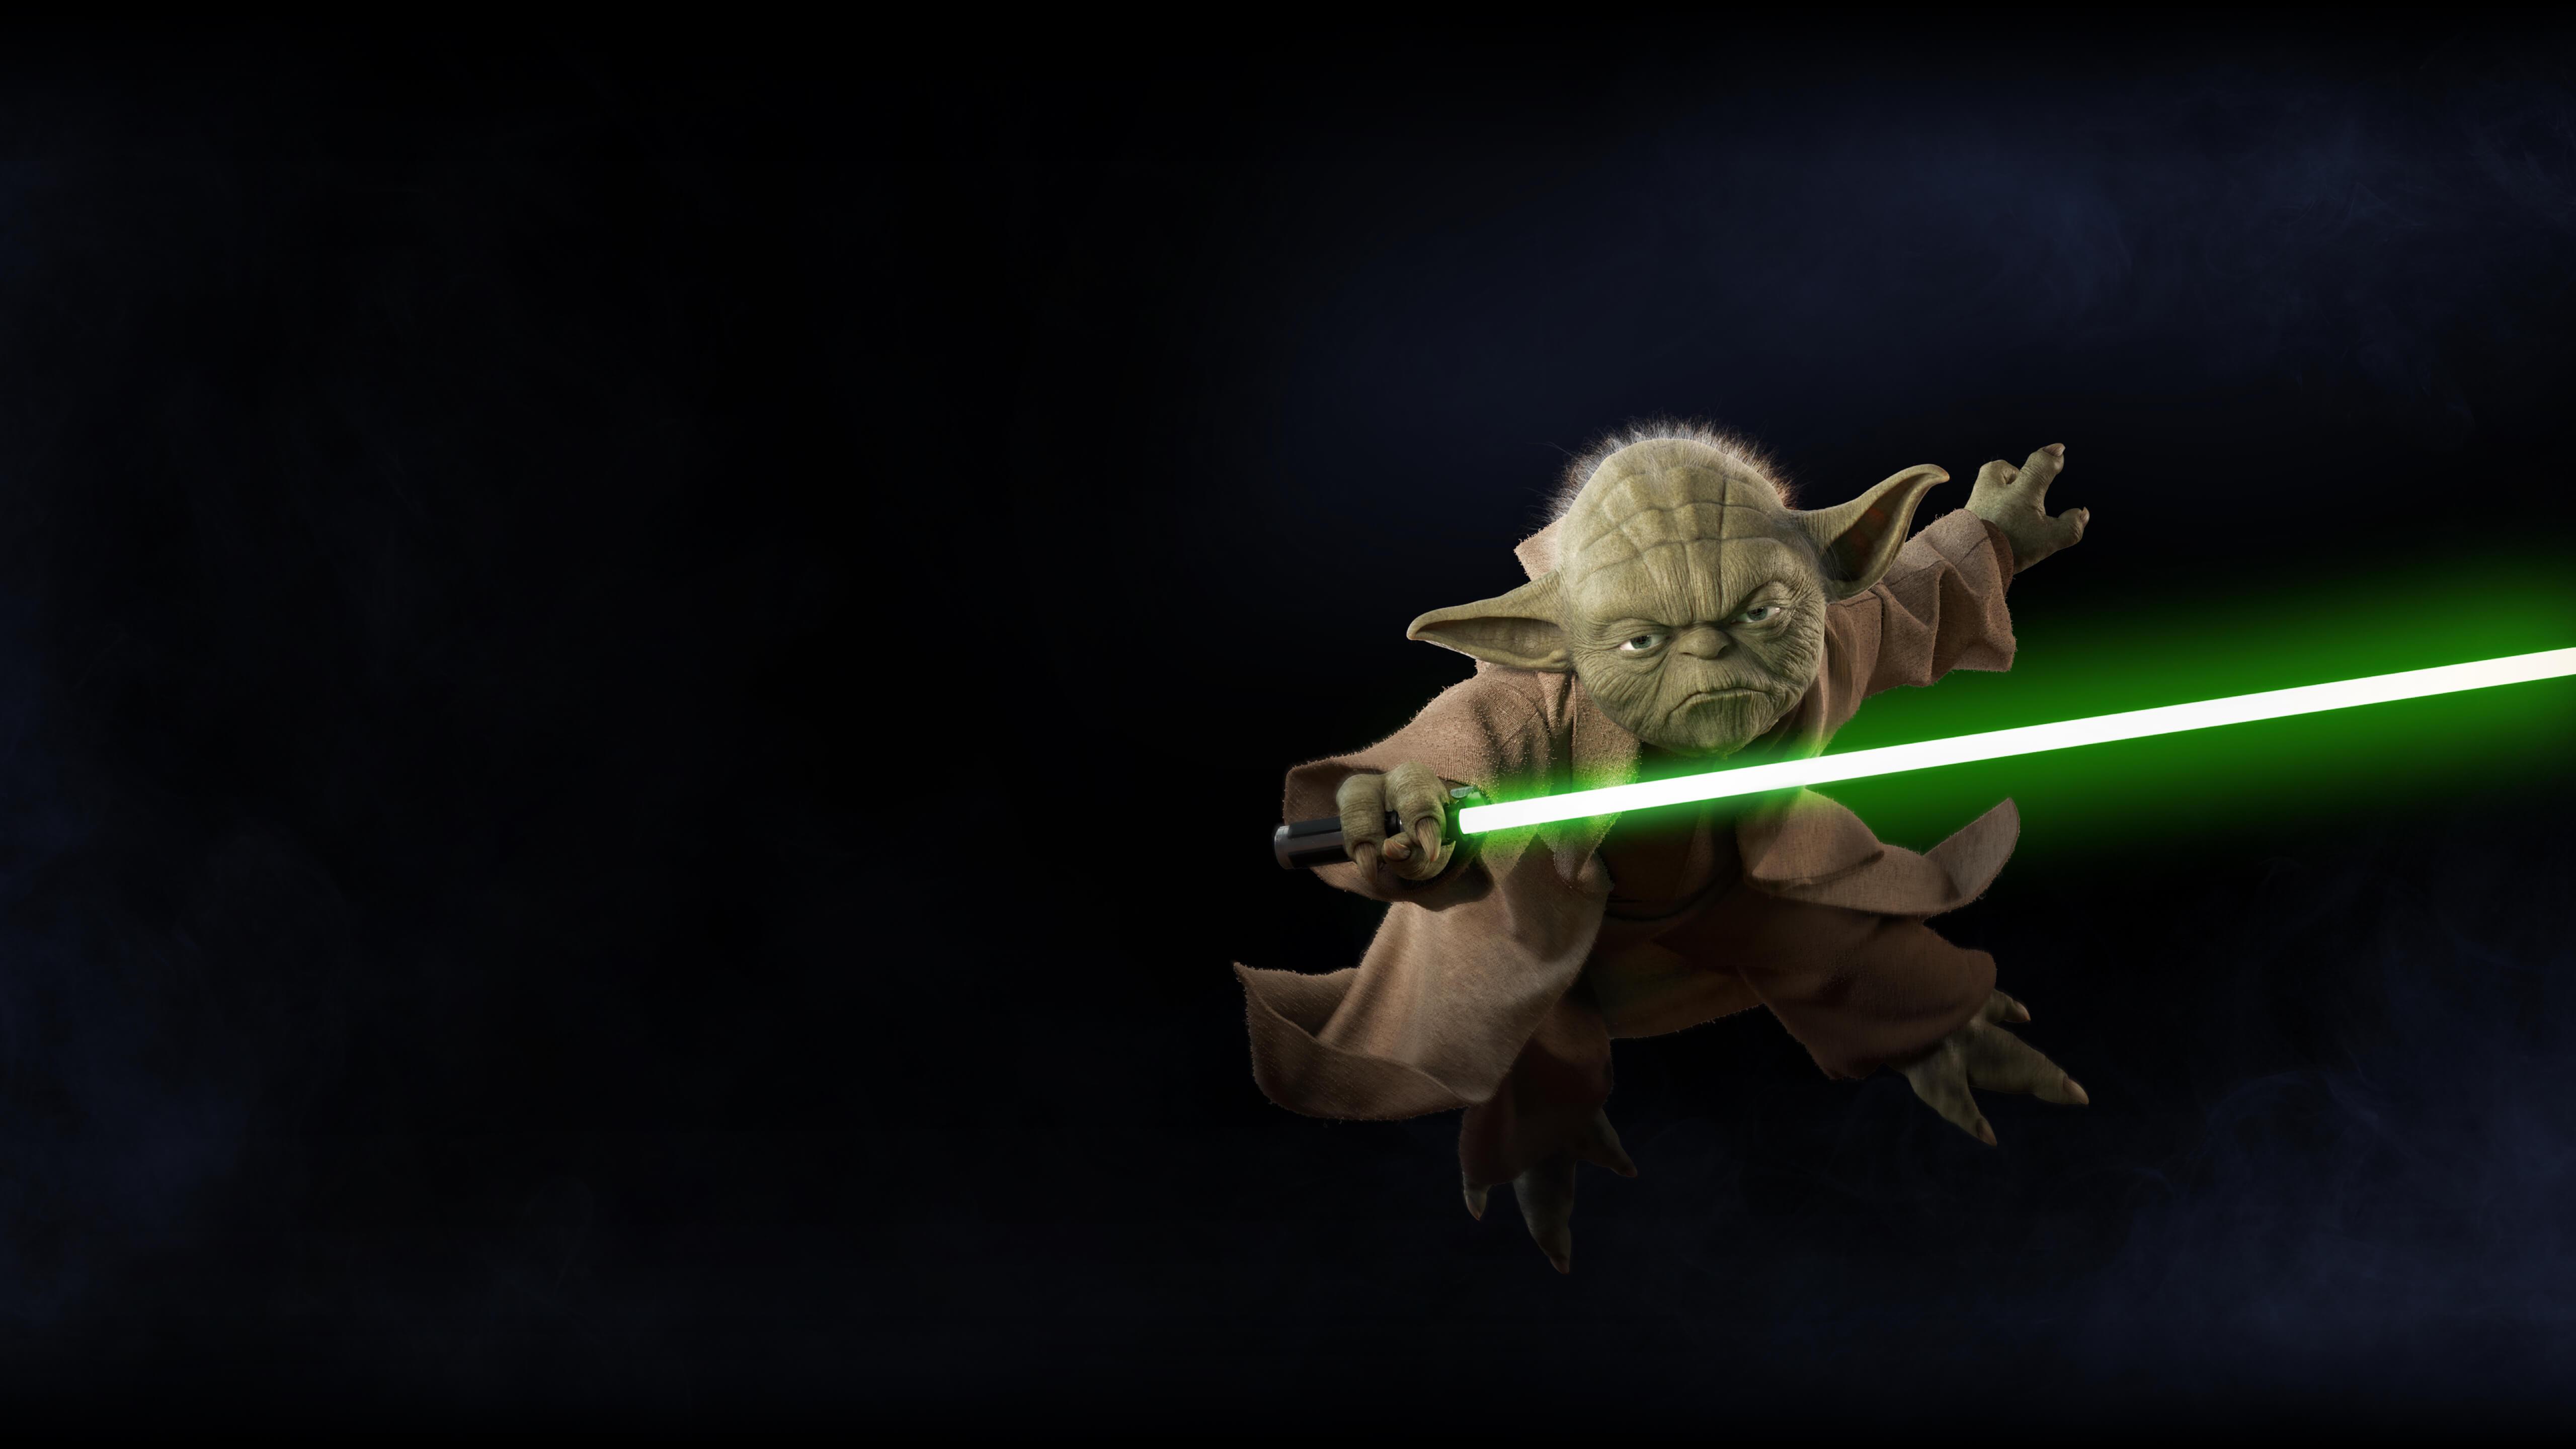 Yoda Hd Wallpaper Posted By Samantha Anderson